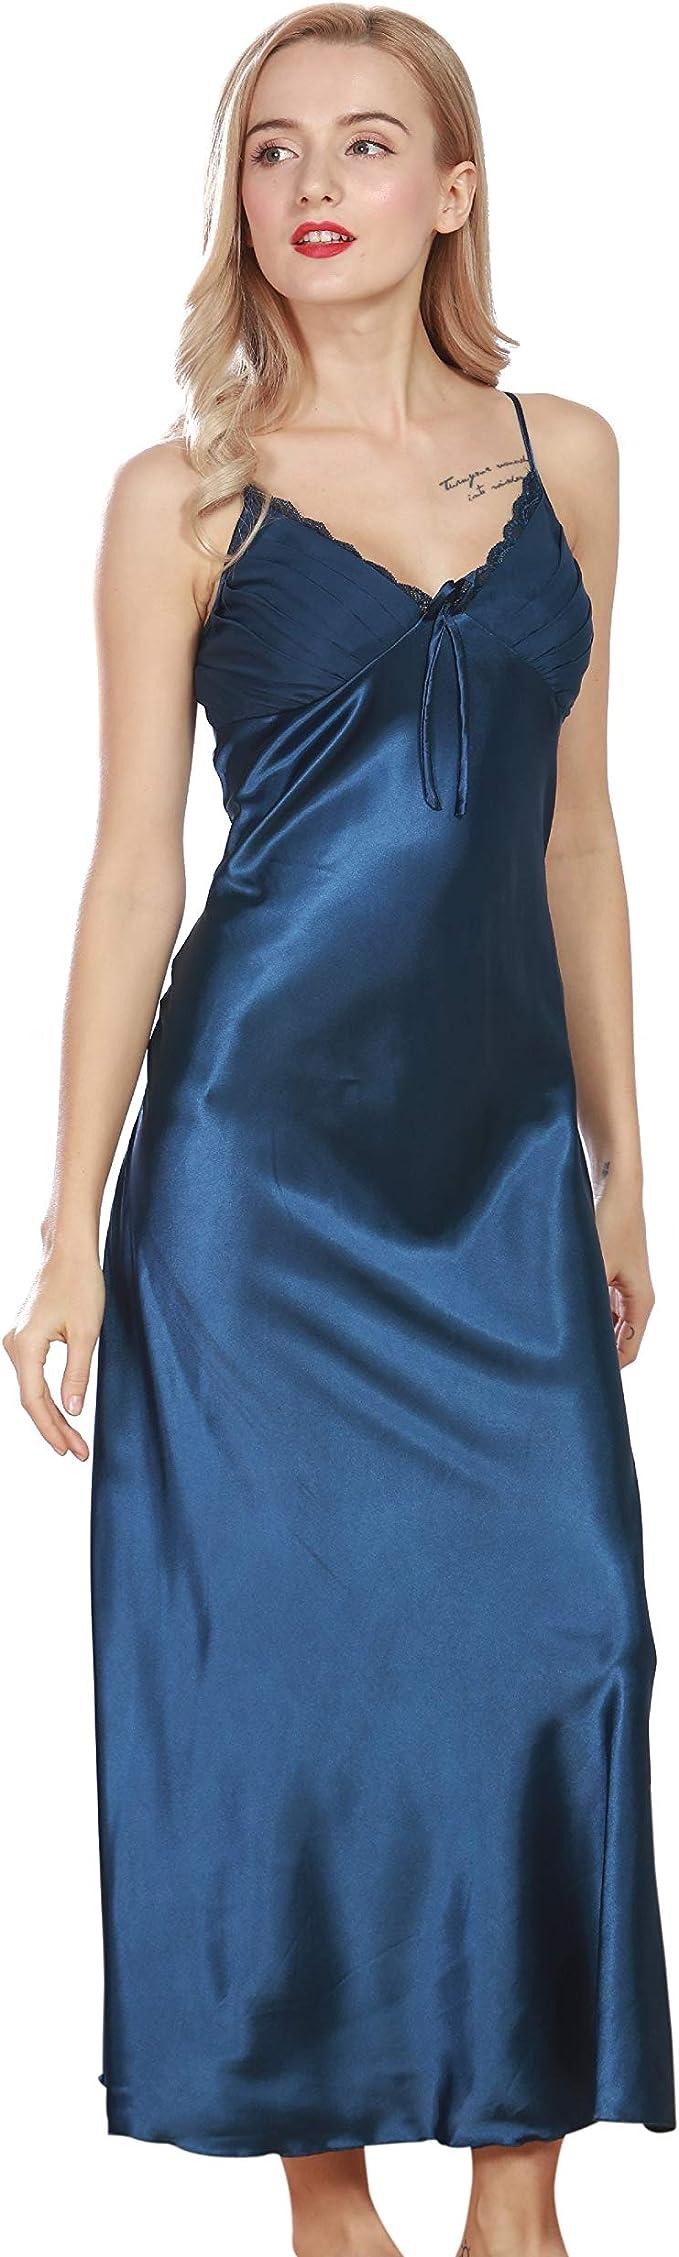 Vintage Inspired Slips Curve Bay Womens Silk Satin Elegant Long Nightgown Pajamas Sleepwear Spaghetti Strap Robe  AT vintagedancer.com